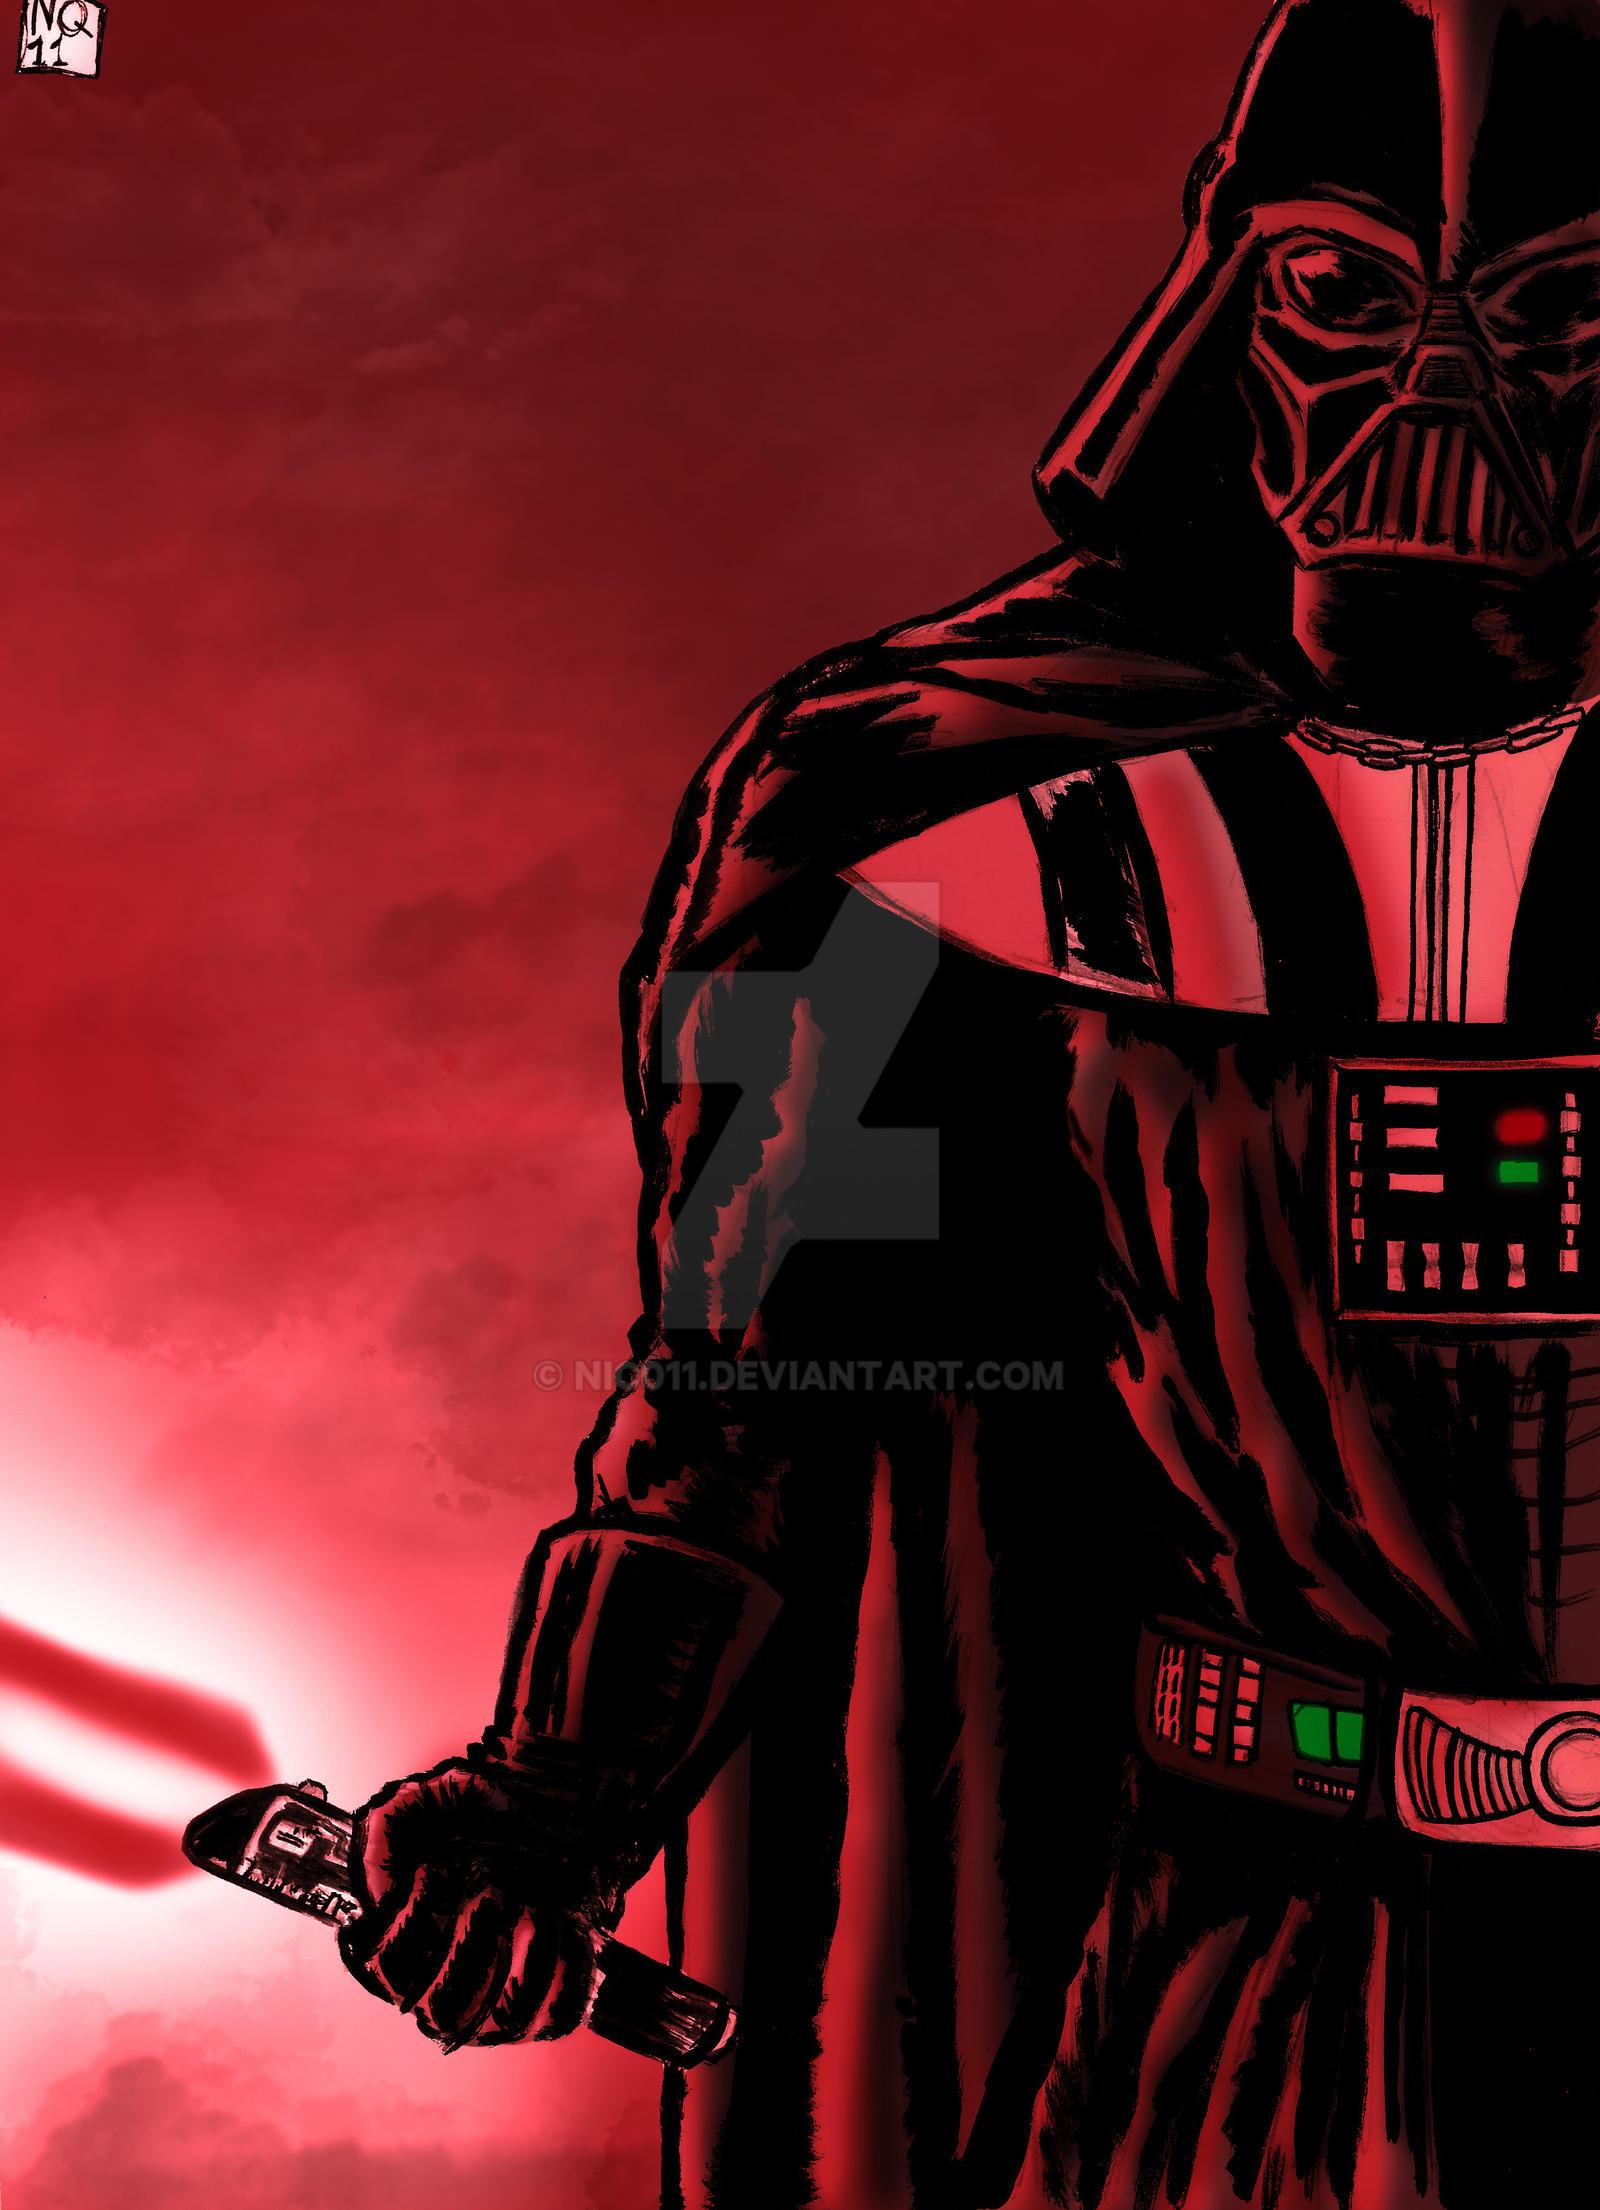 Darth Vader by nic011